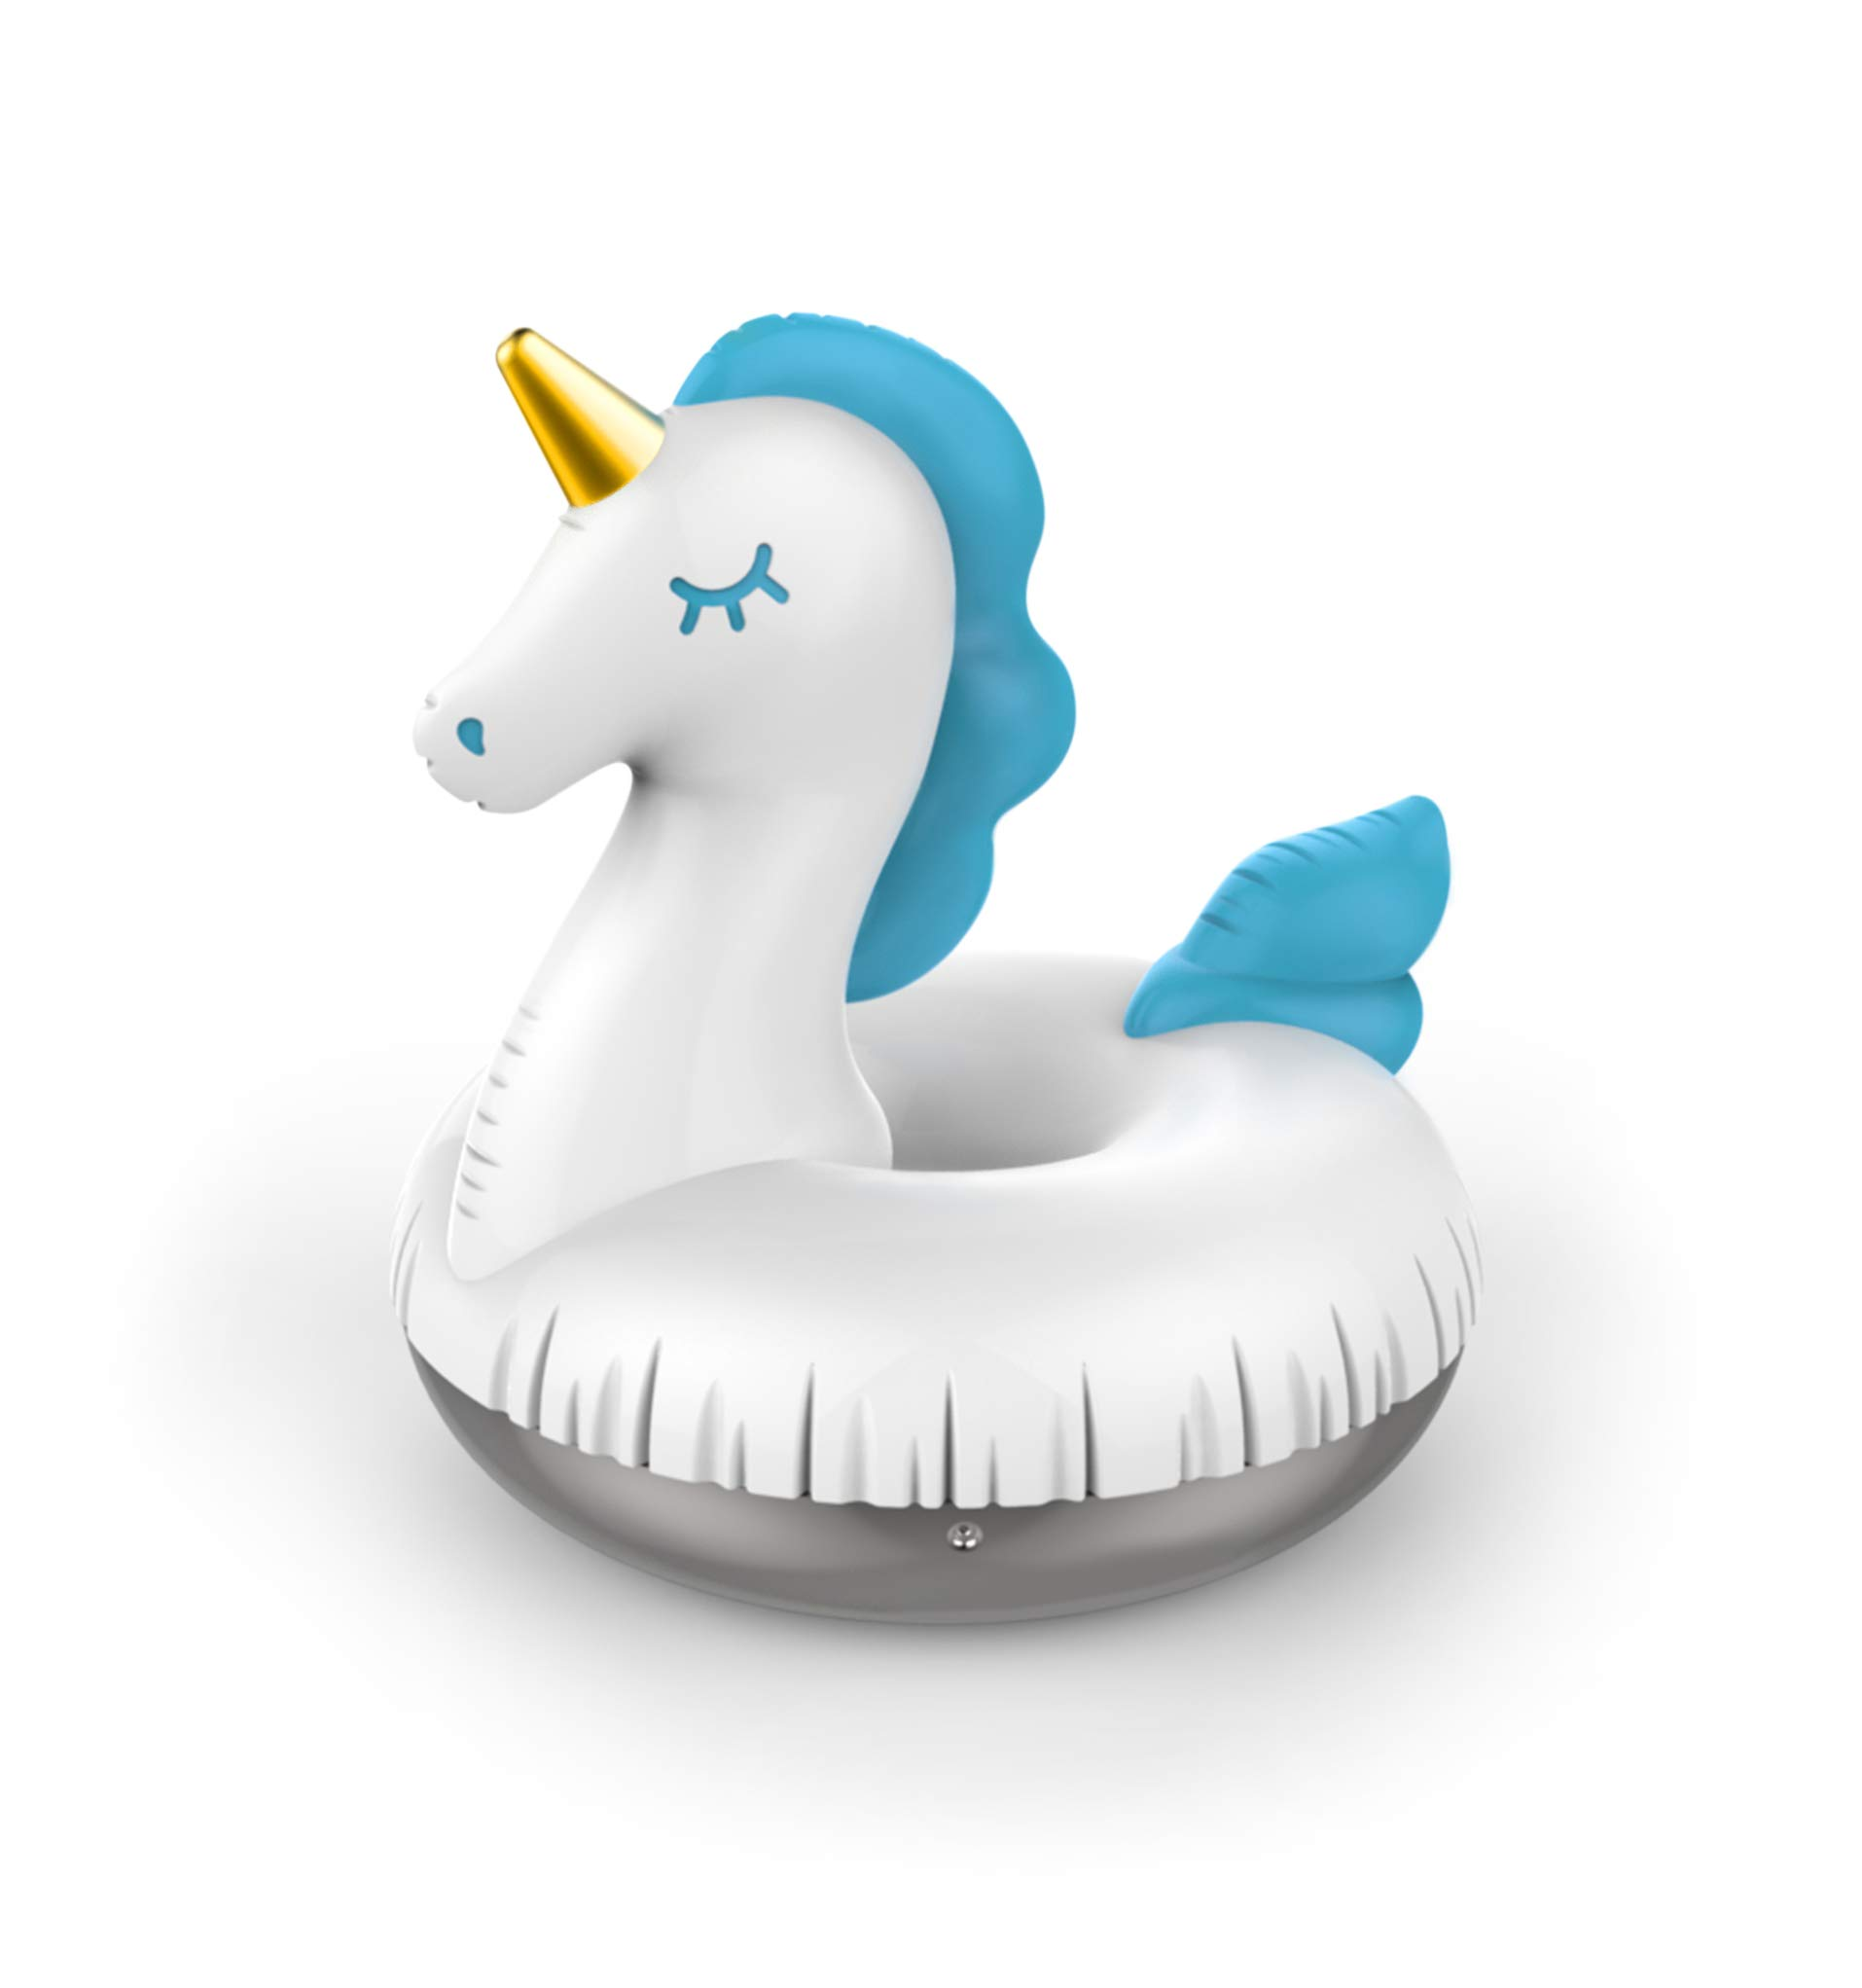 Fred - Fred & Friends 5238780 Unicorn Pool Float Tea Infuser regular